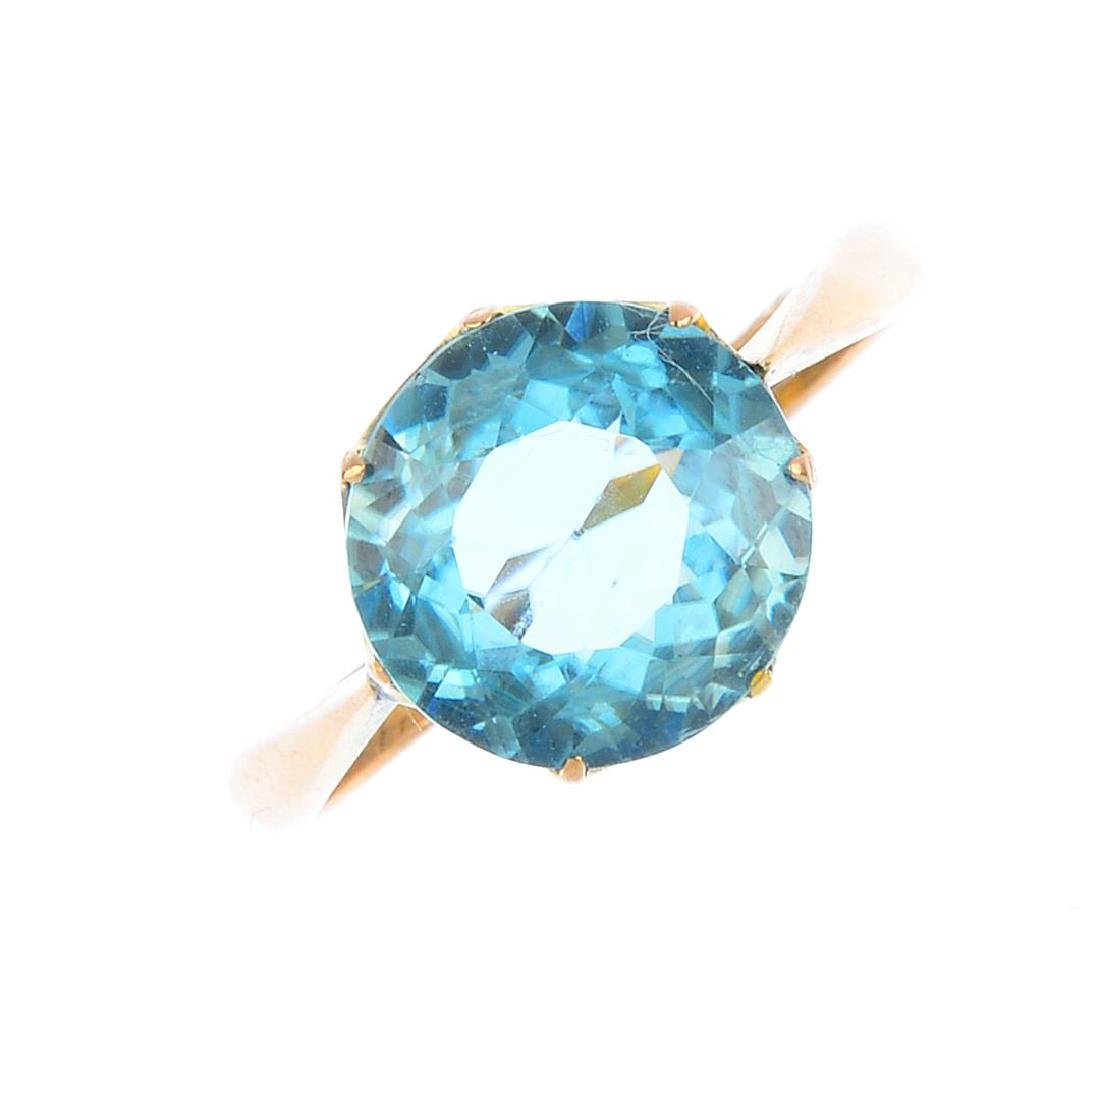 A zircon single-stone ring. The circular-shape blue